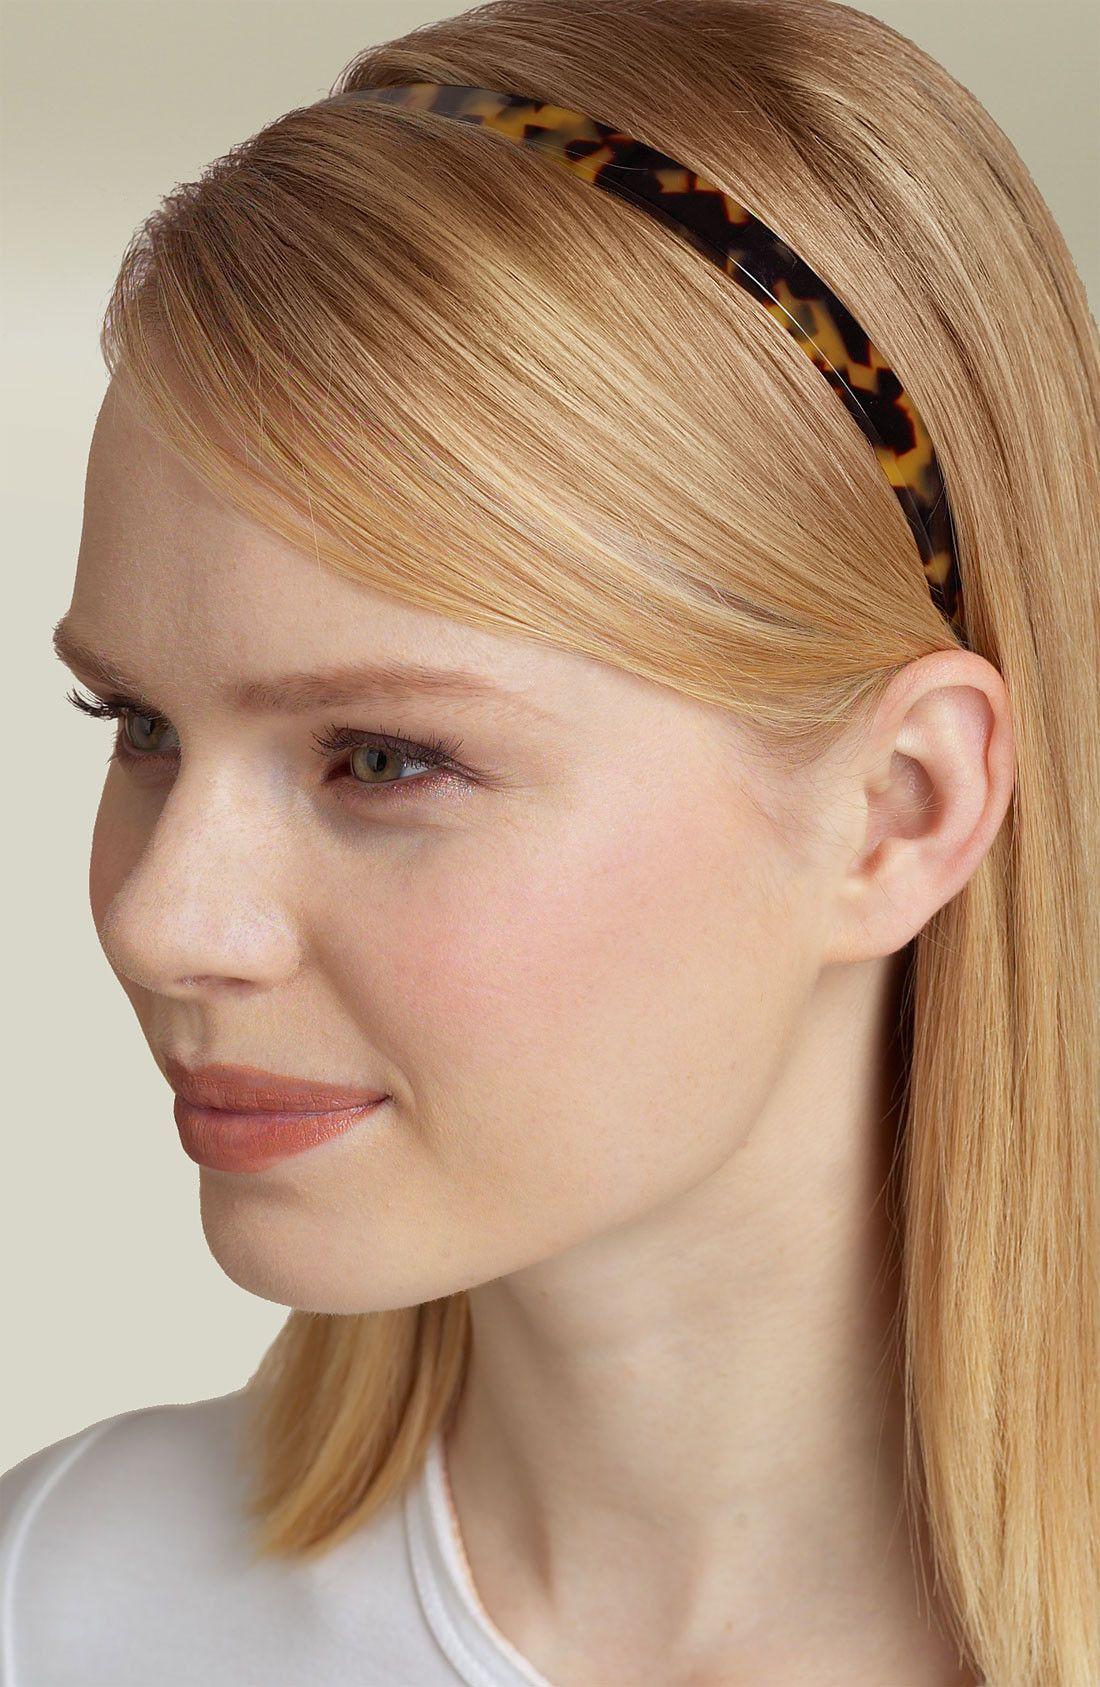 Skinny headband interview hair pinterest skinny headbands